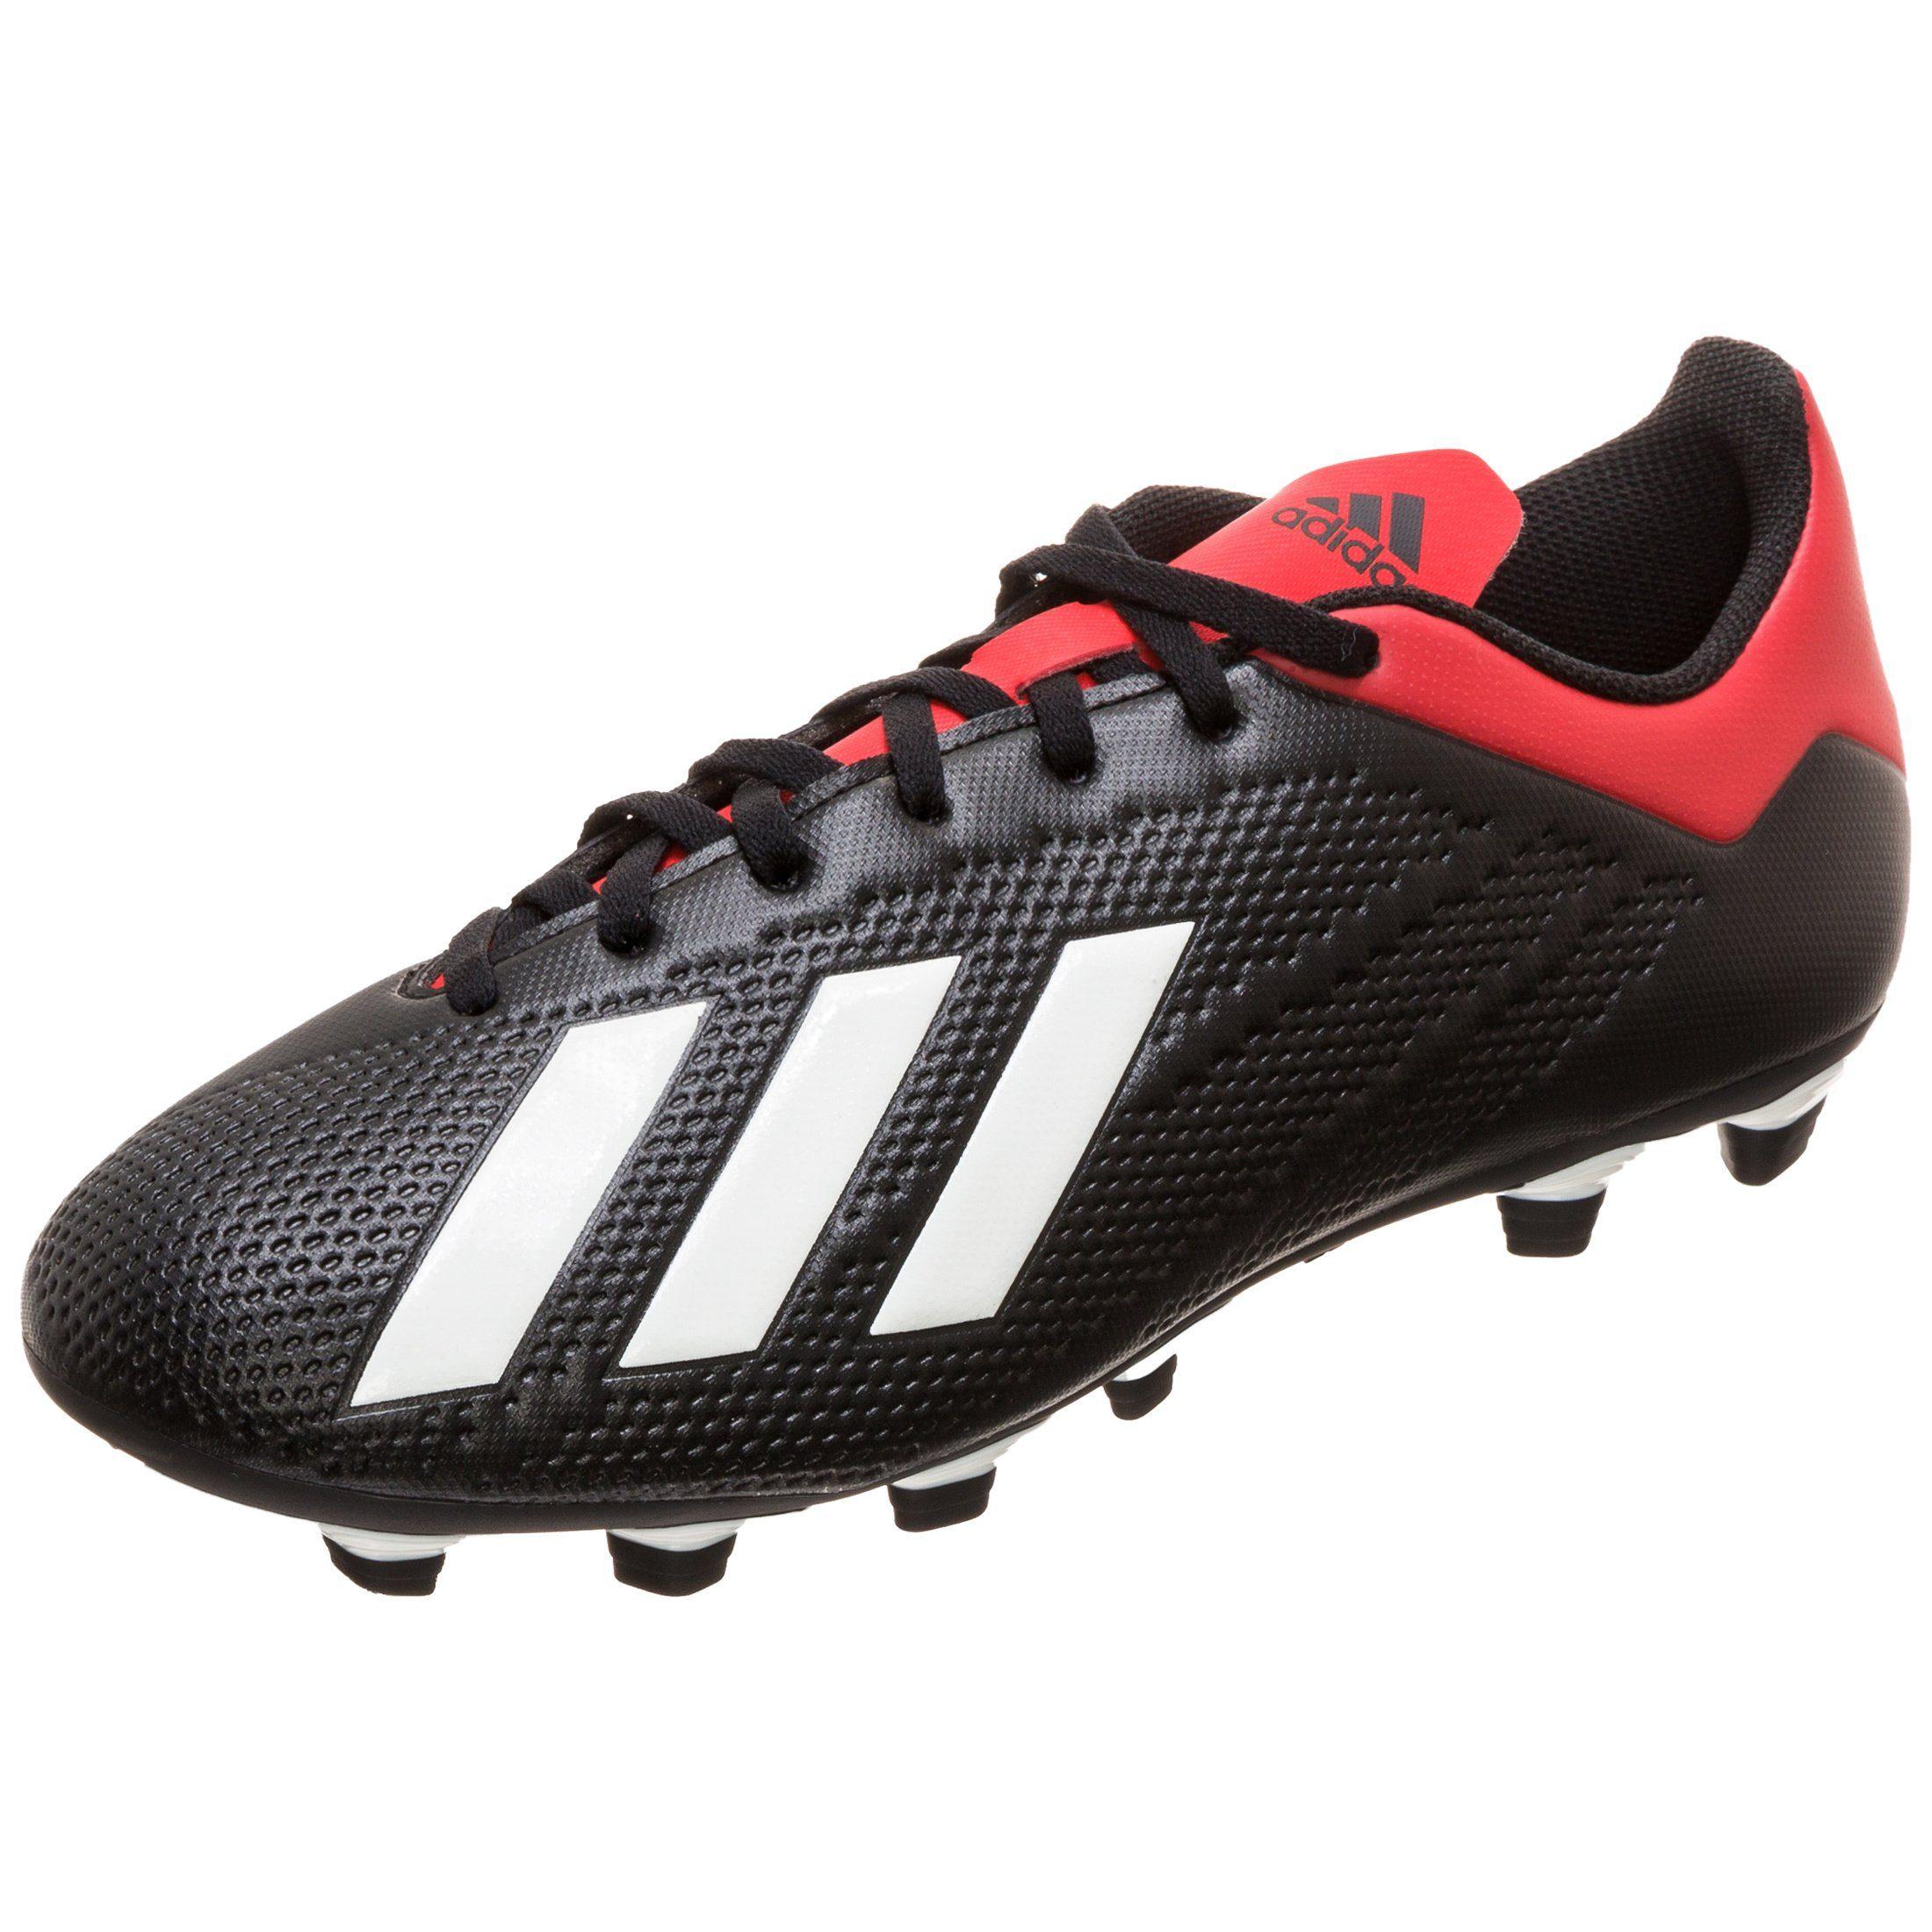 adidas Performance Fußballschuh X 184 Preisvergleich